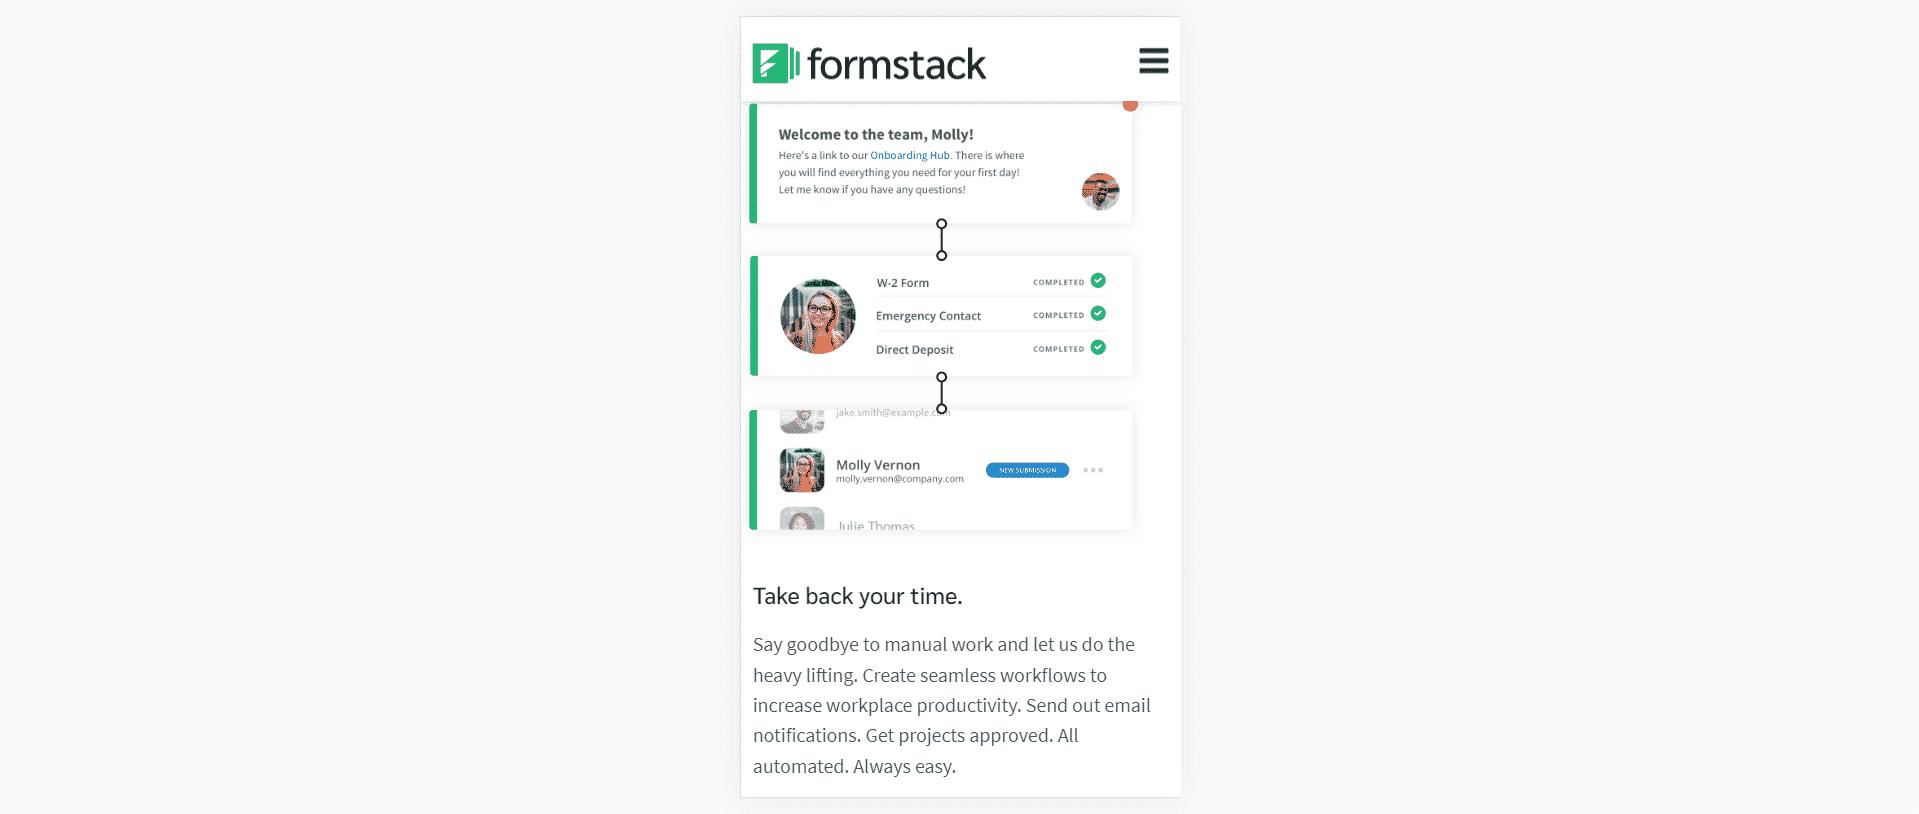 Mobile-1- Formstack